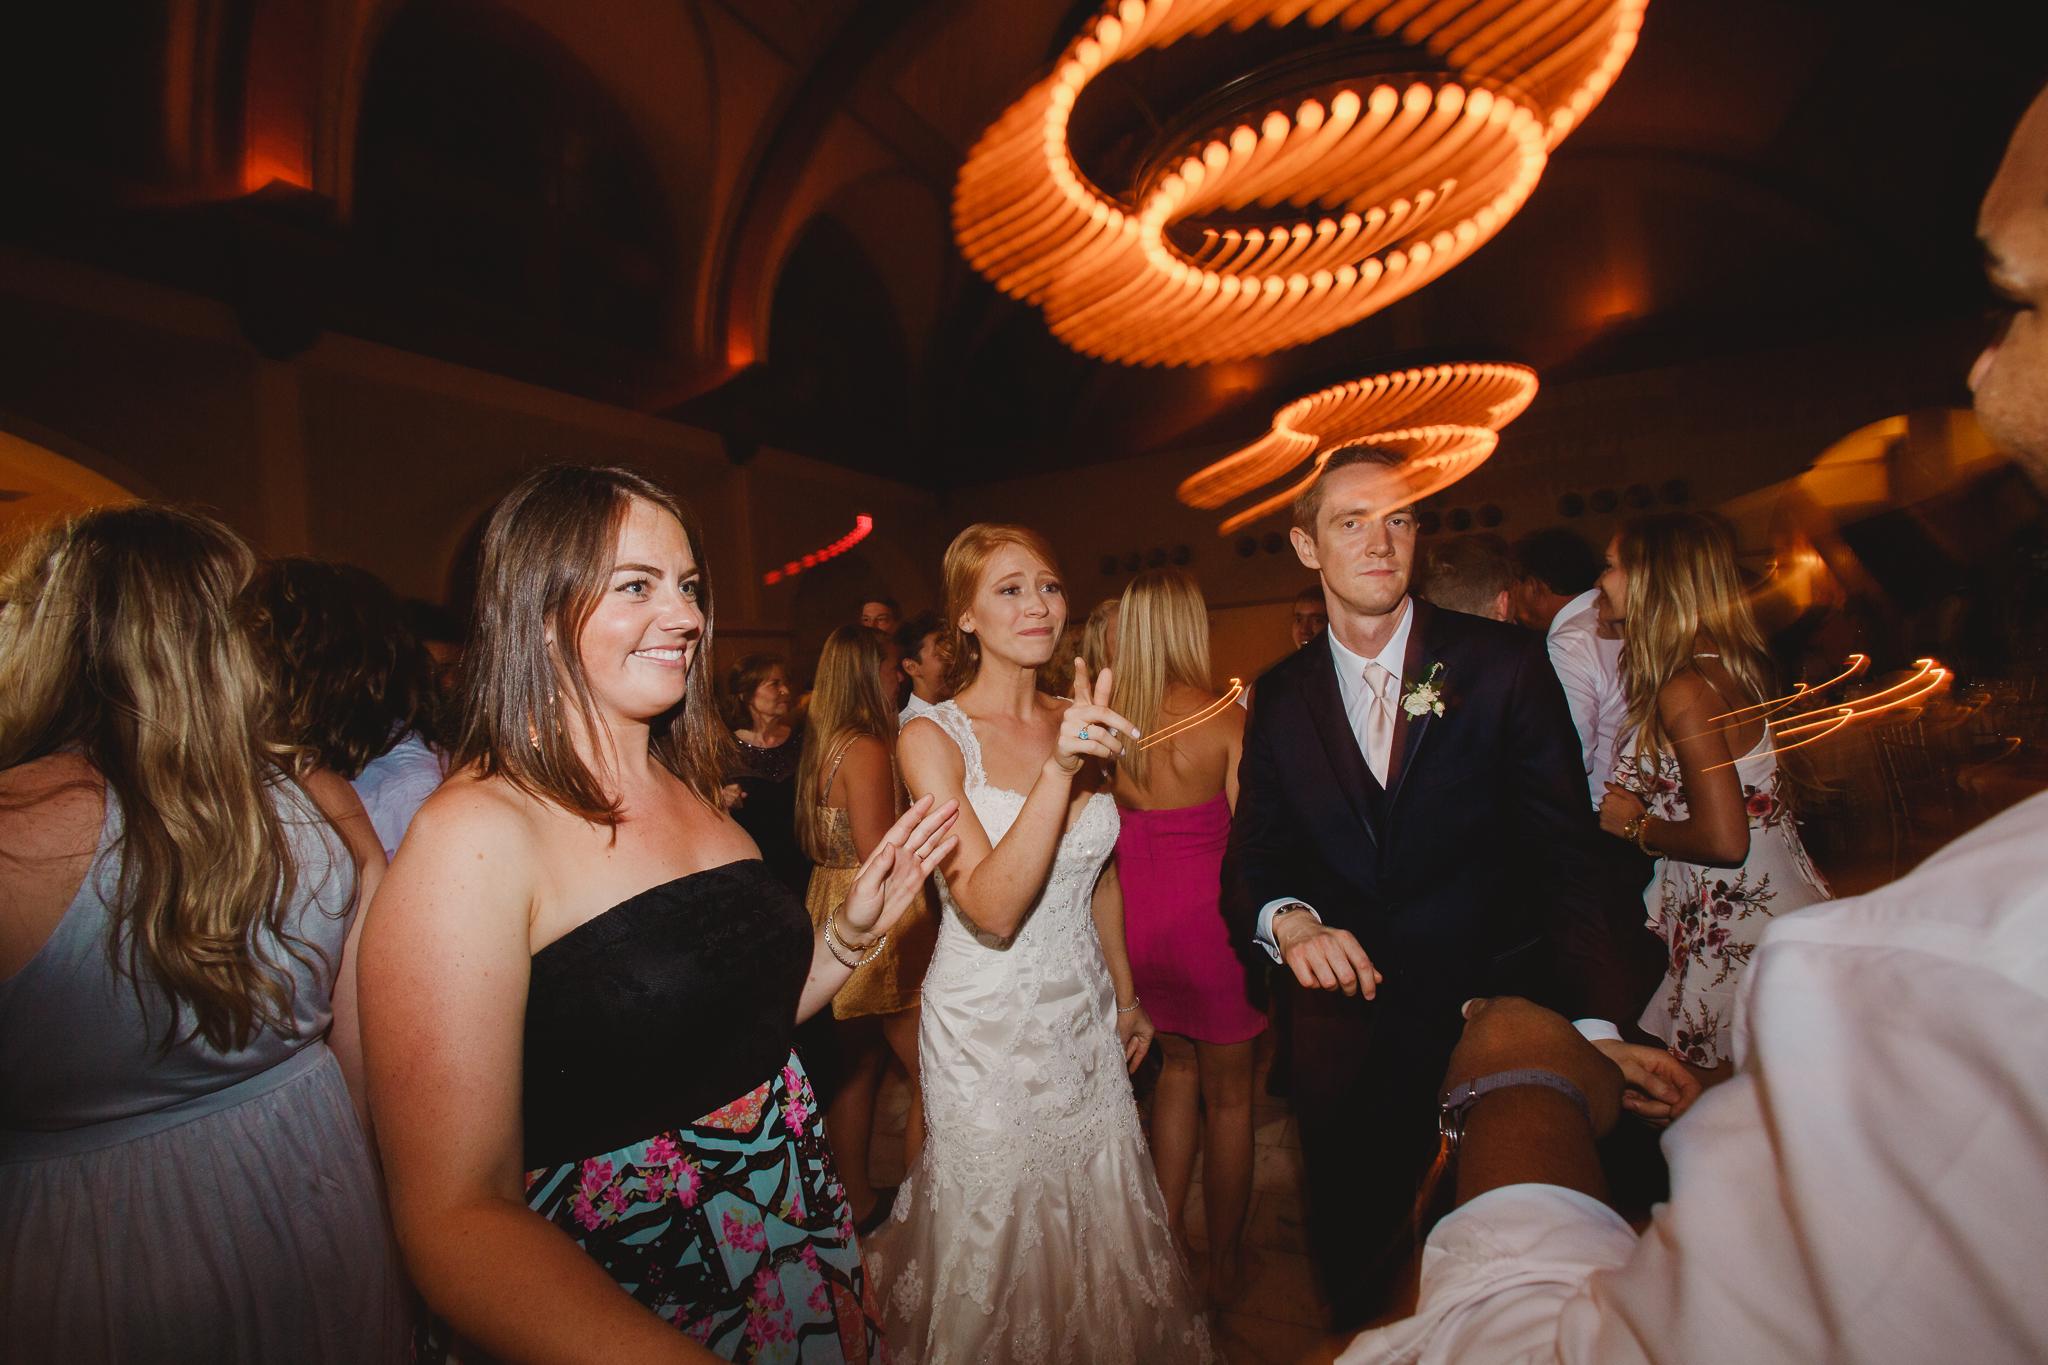 Michael and Kelly - the ashton depot - wedding DFW - wedding photographer- elizalde photography (127 of 150).jpg